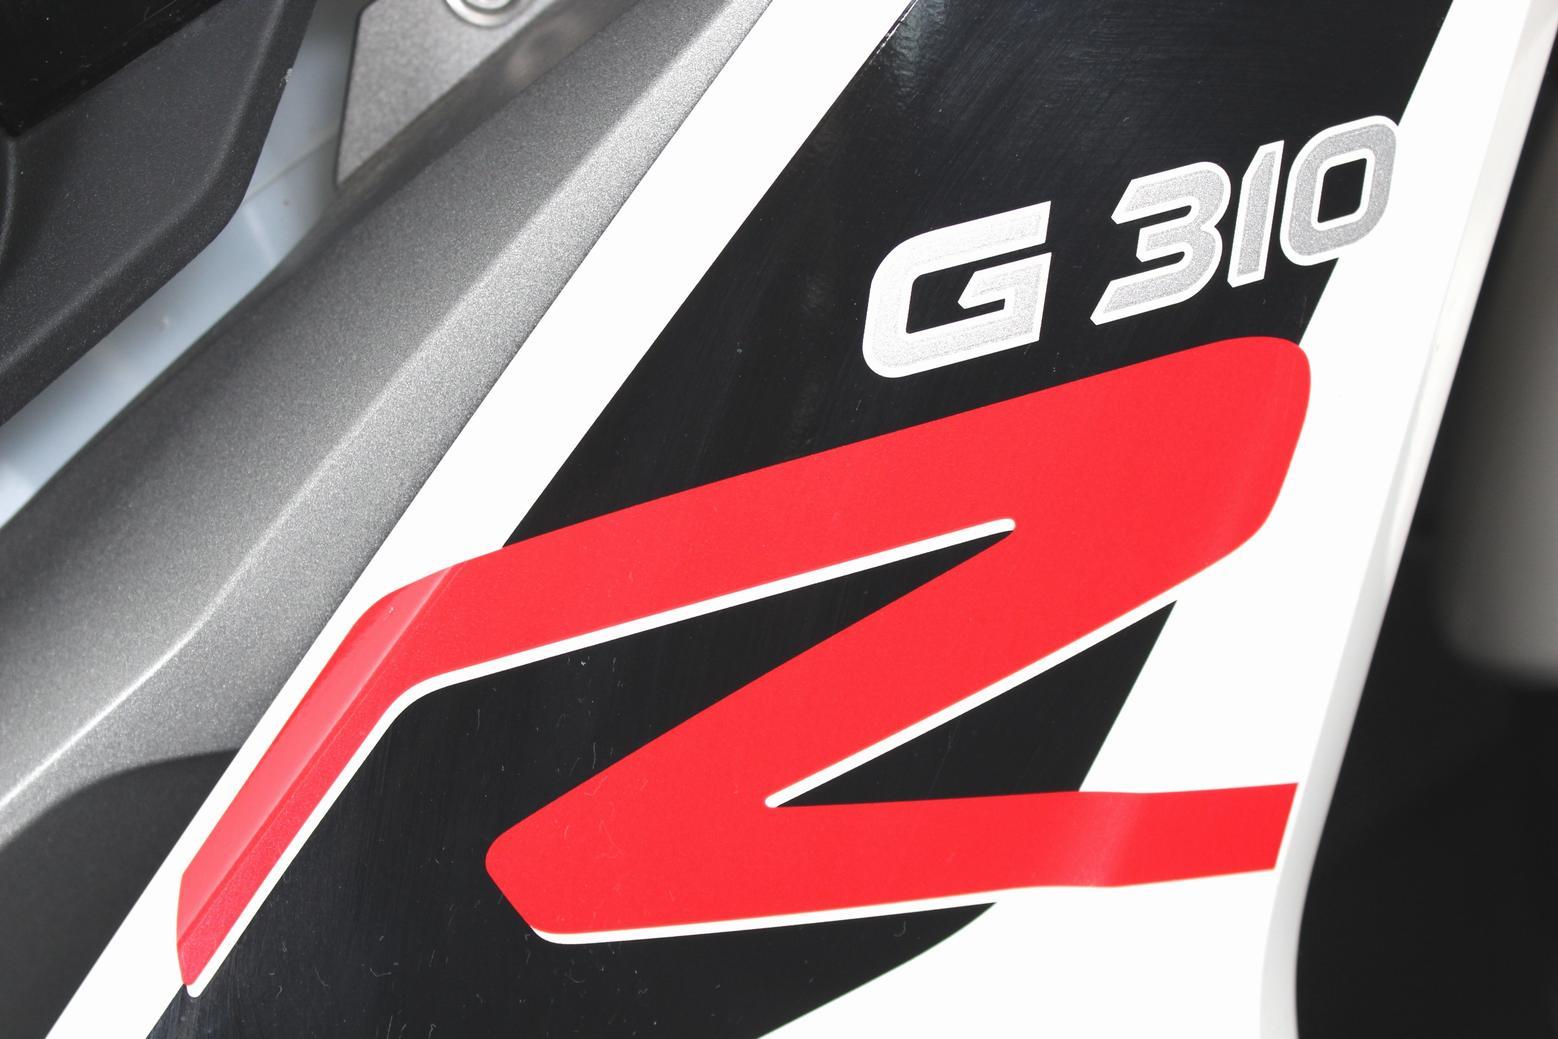 BMW - G 310 R A2 rijbewijs geschikt